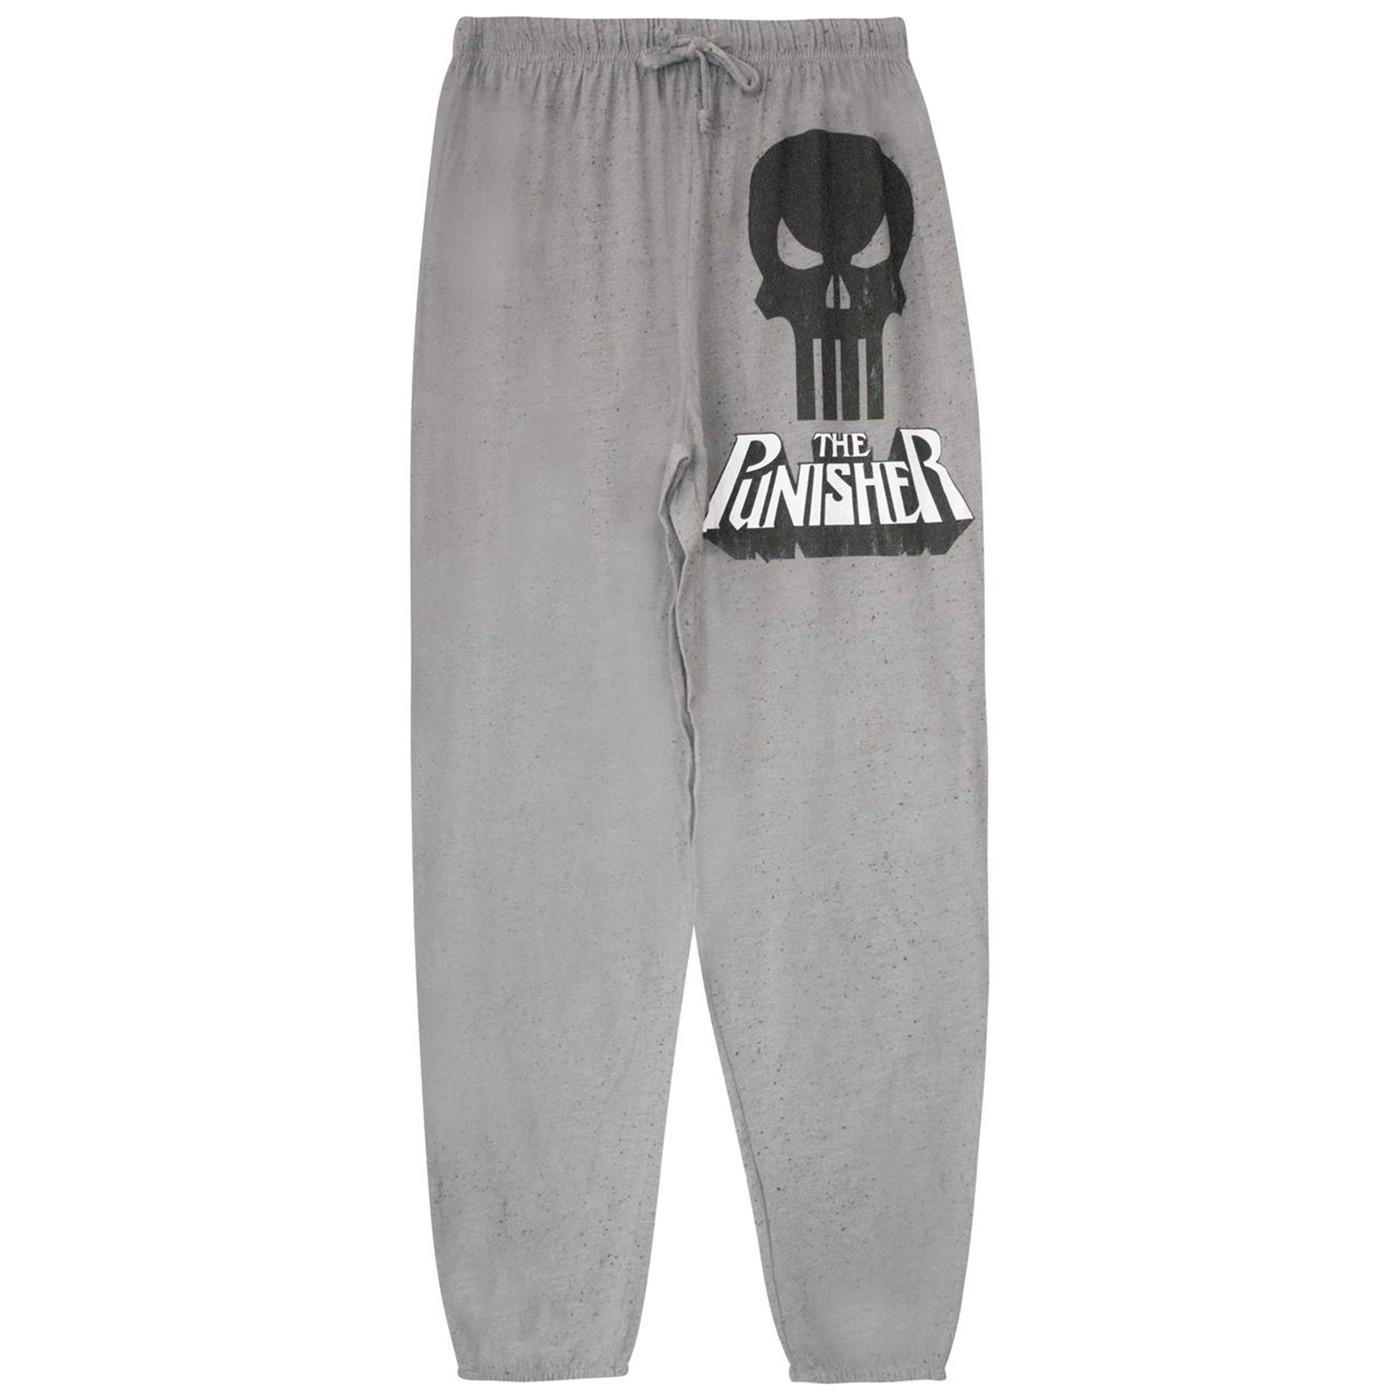 Punisher Skull & Logo Athletic Men's Pajama Pants